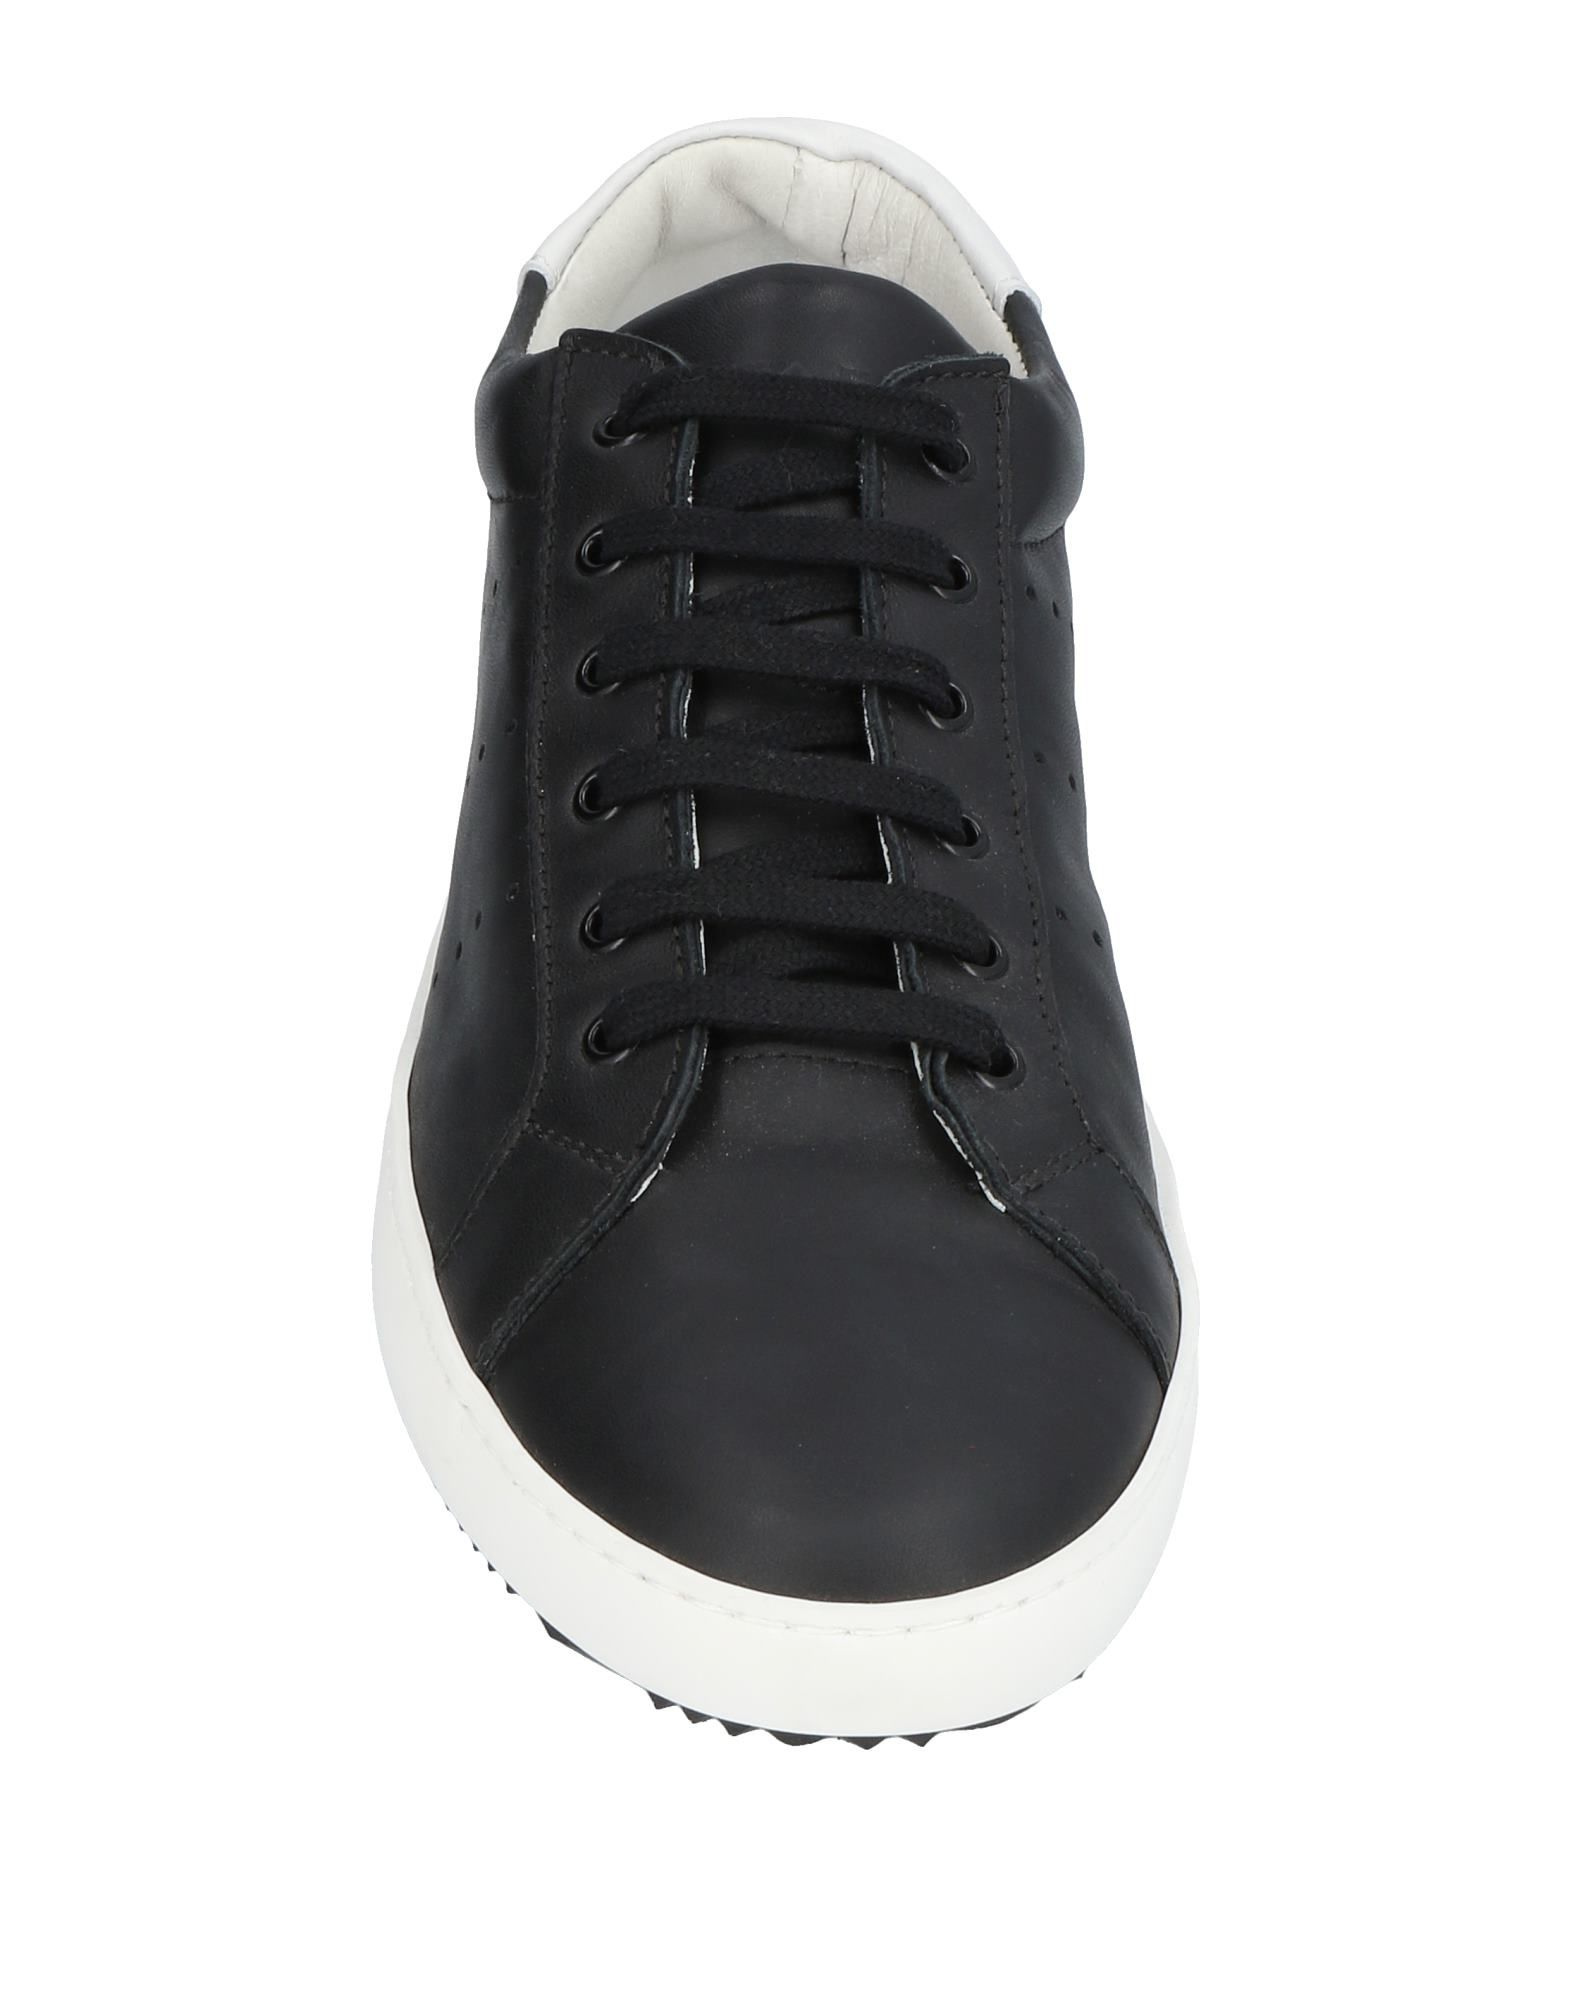 Liviana Conti Sneakers Damen   Damen 11196219LO 5be0f9